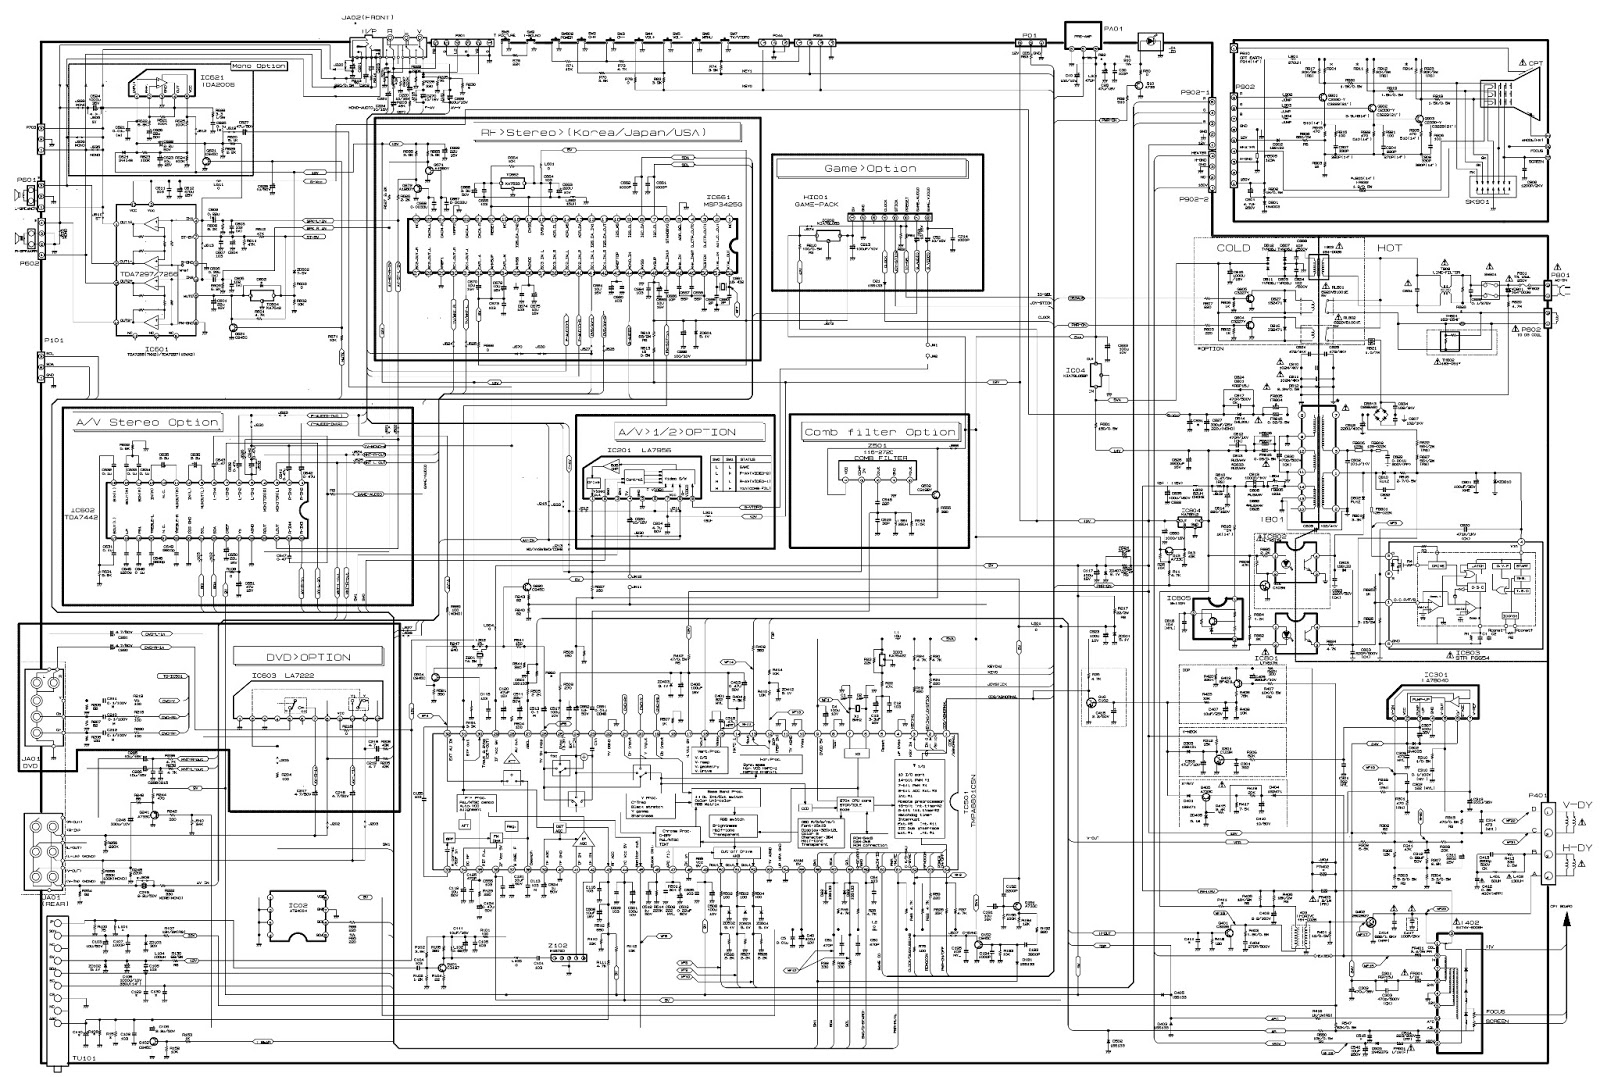 LG RP21FD10  SCHEMATIC DIAGRAM  Used ICs  TDA2006